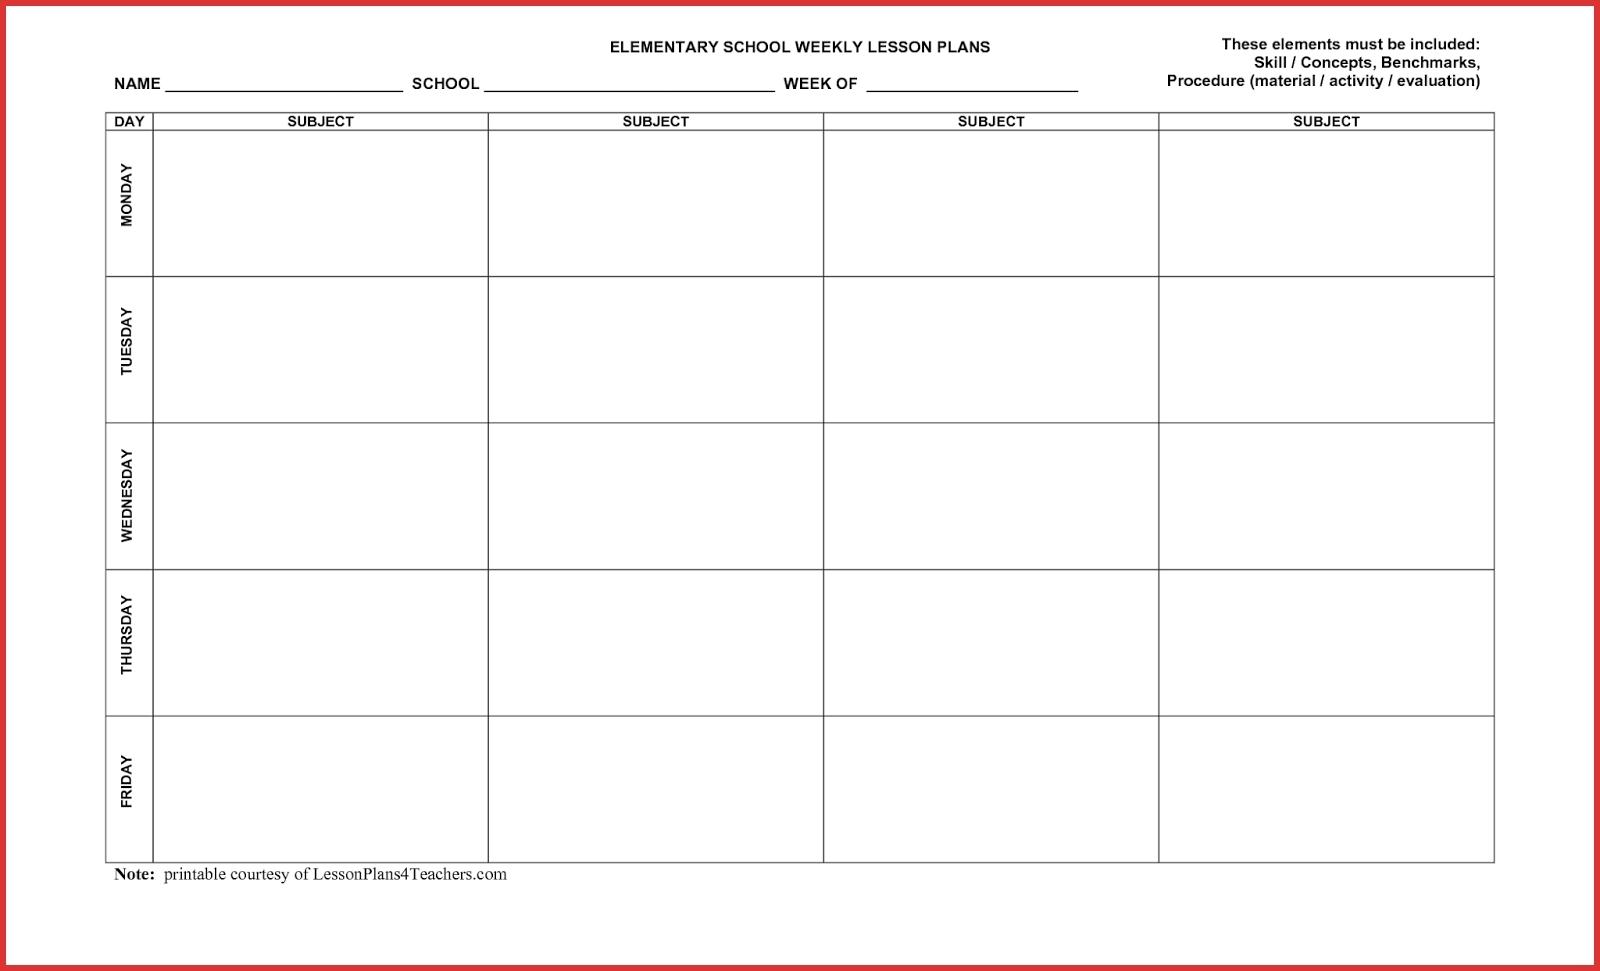 Day Weekly Calendar Template E2 80 93 Week Schedule Microsoft Word for 5 Day Week Calendar Template